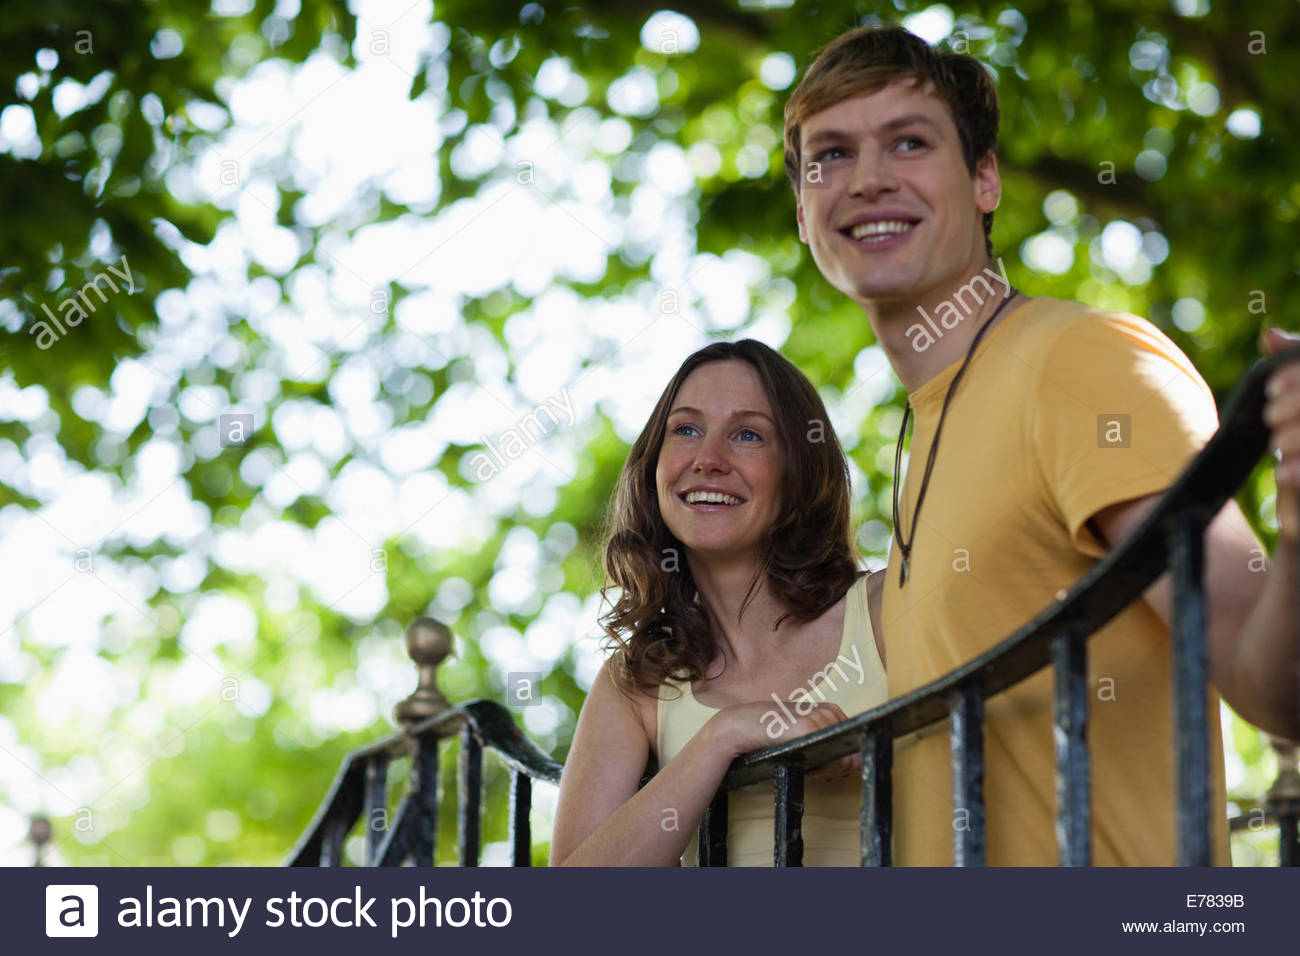 Smiling couple leaning on railing outdoors - Stock Image